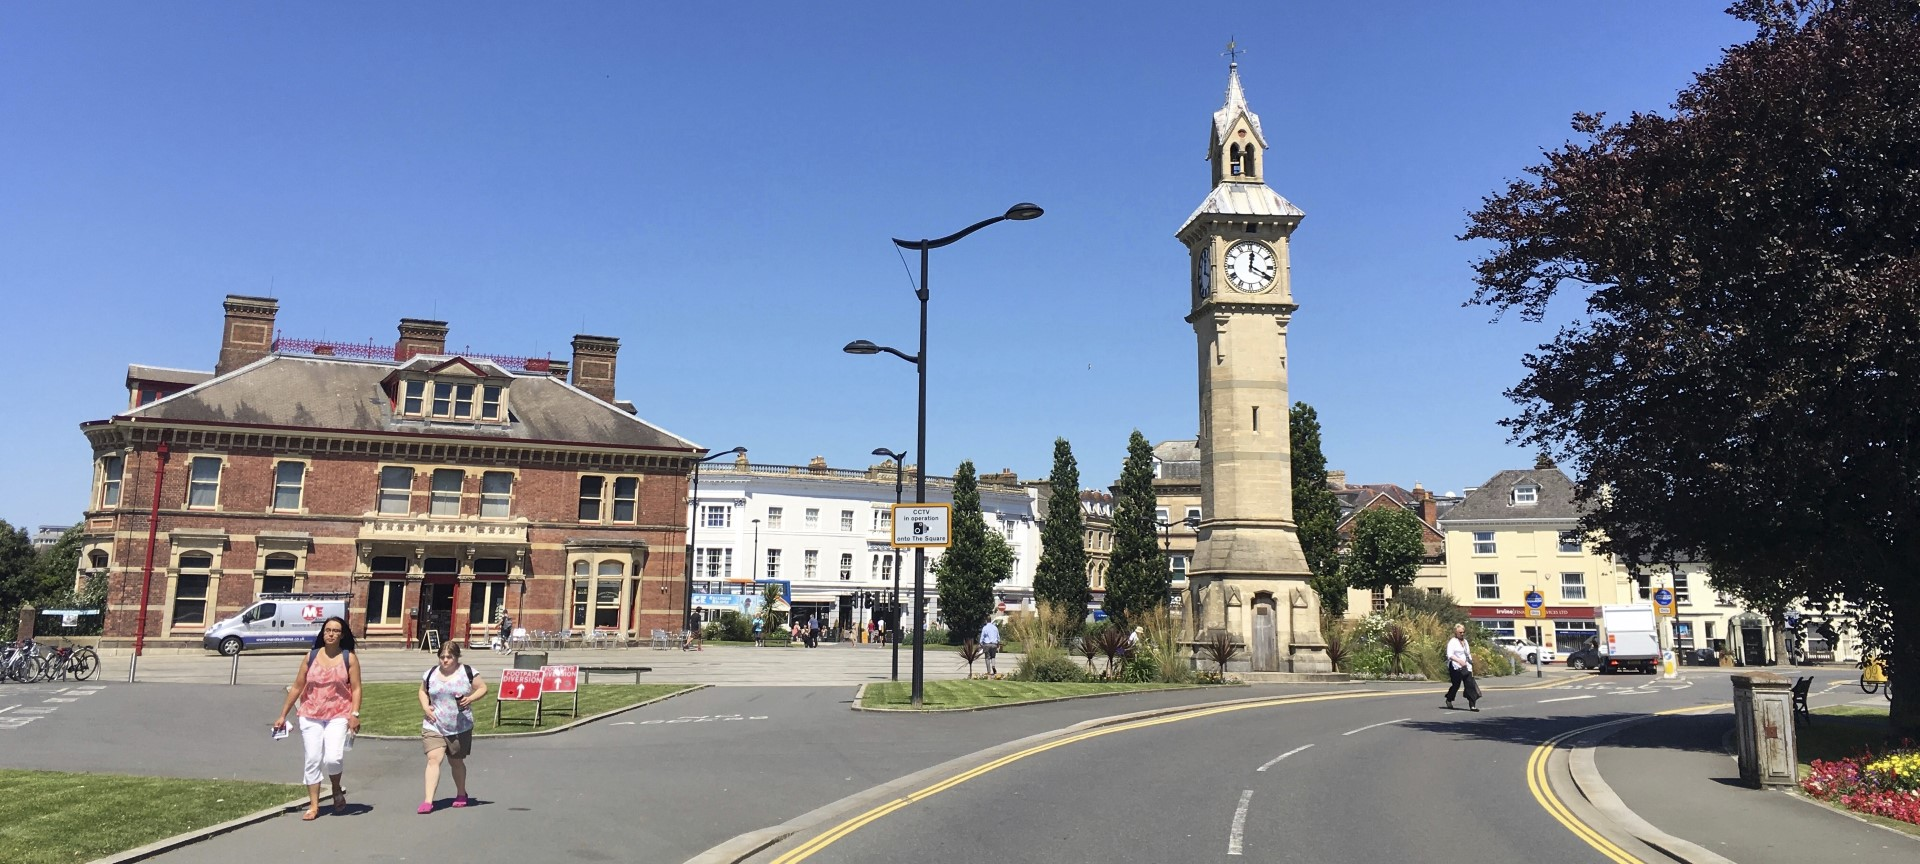 Barnstaple Town Center